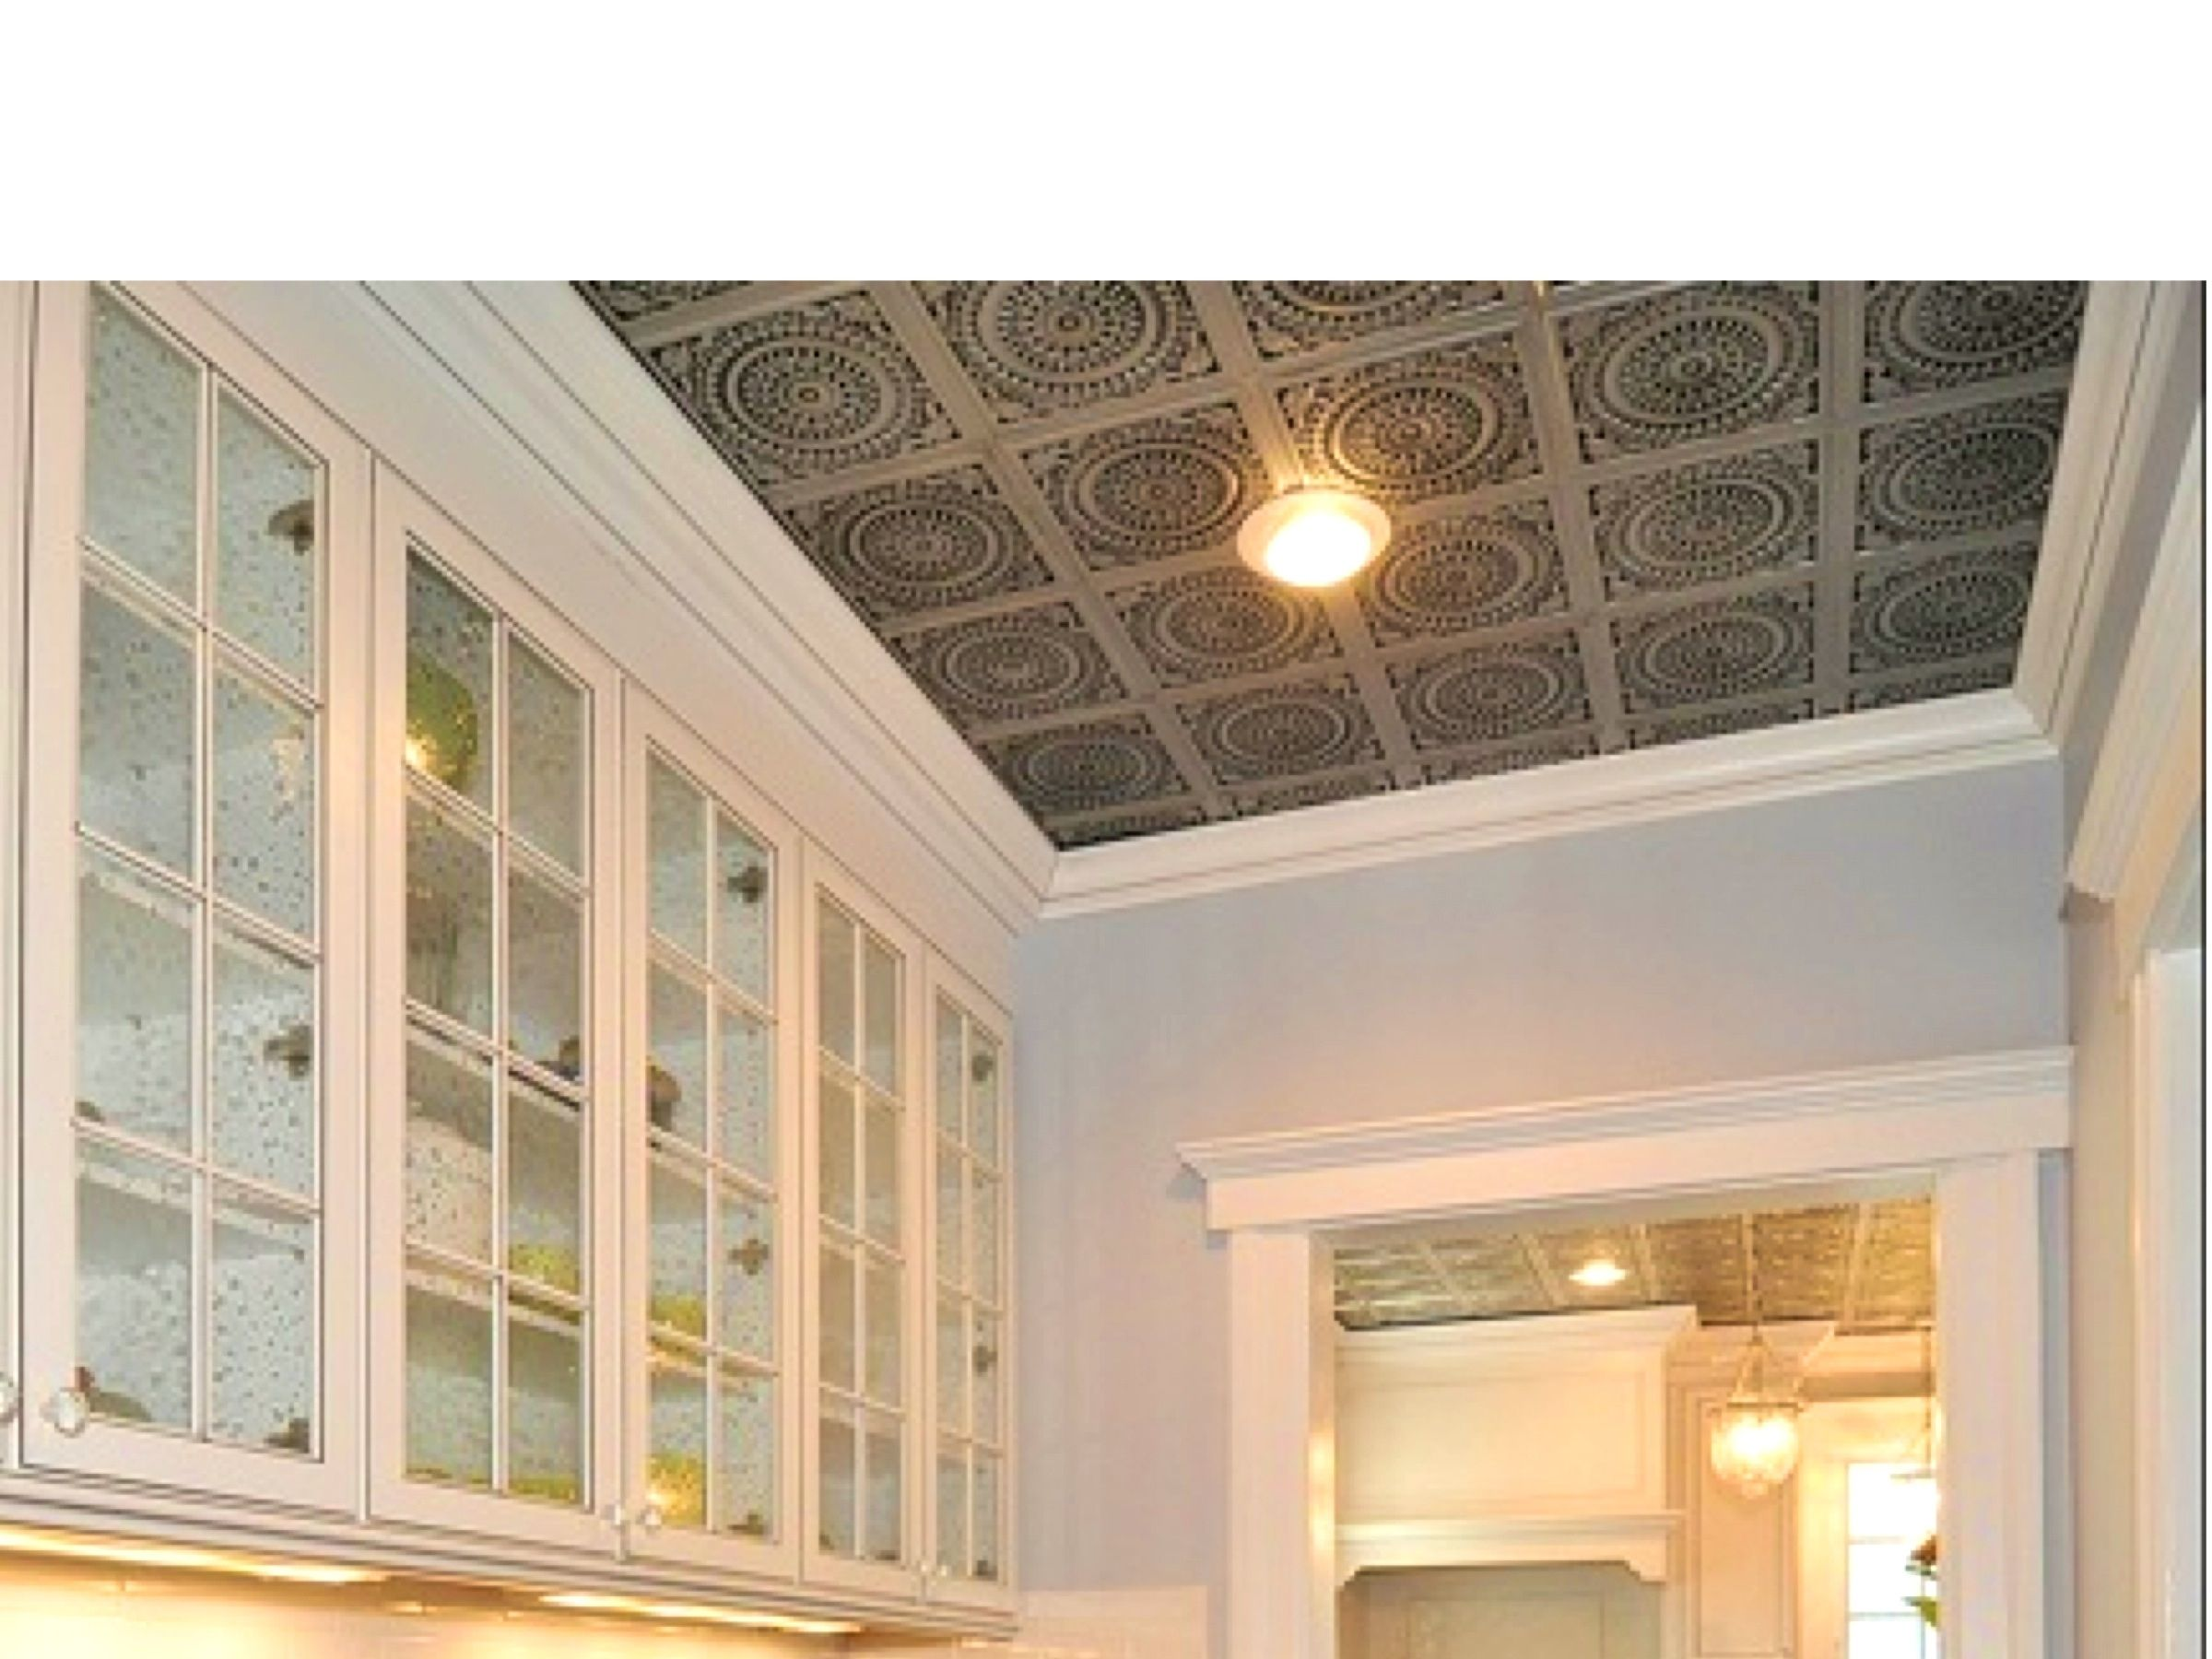 tile ceilings acoustical optima iida armstrong oregon ceiling canopy iidaor pin by